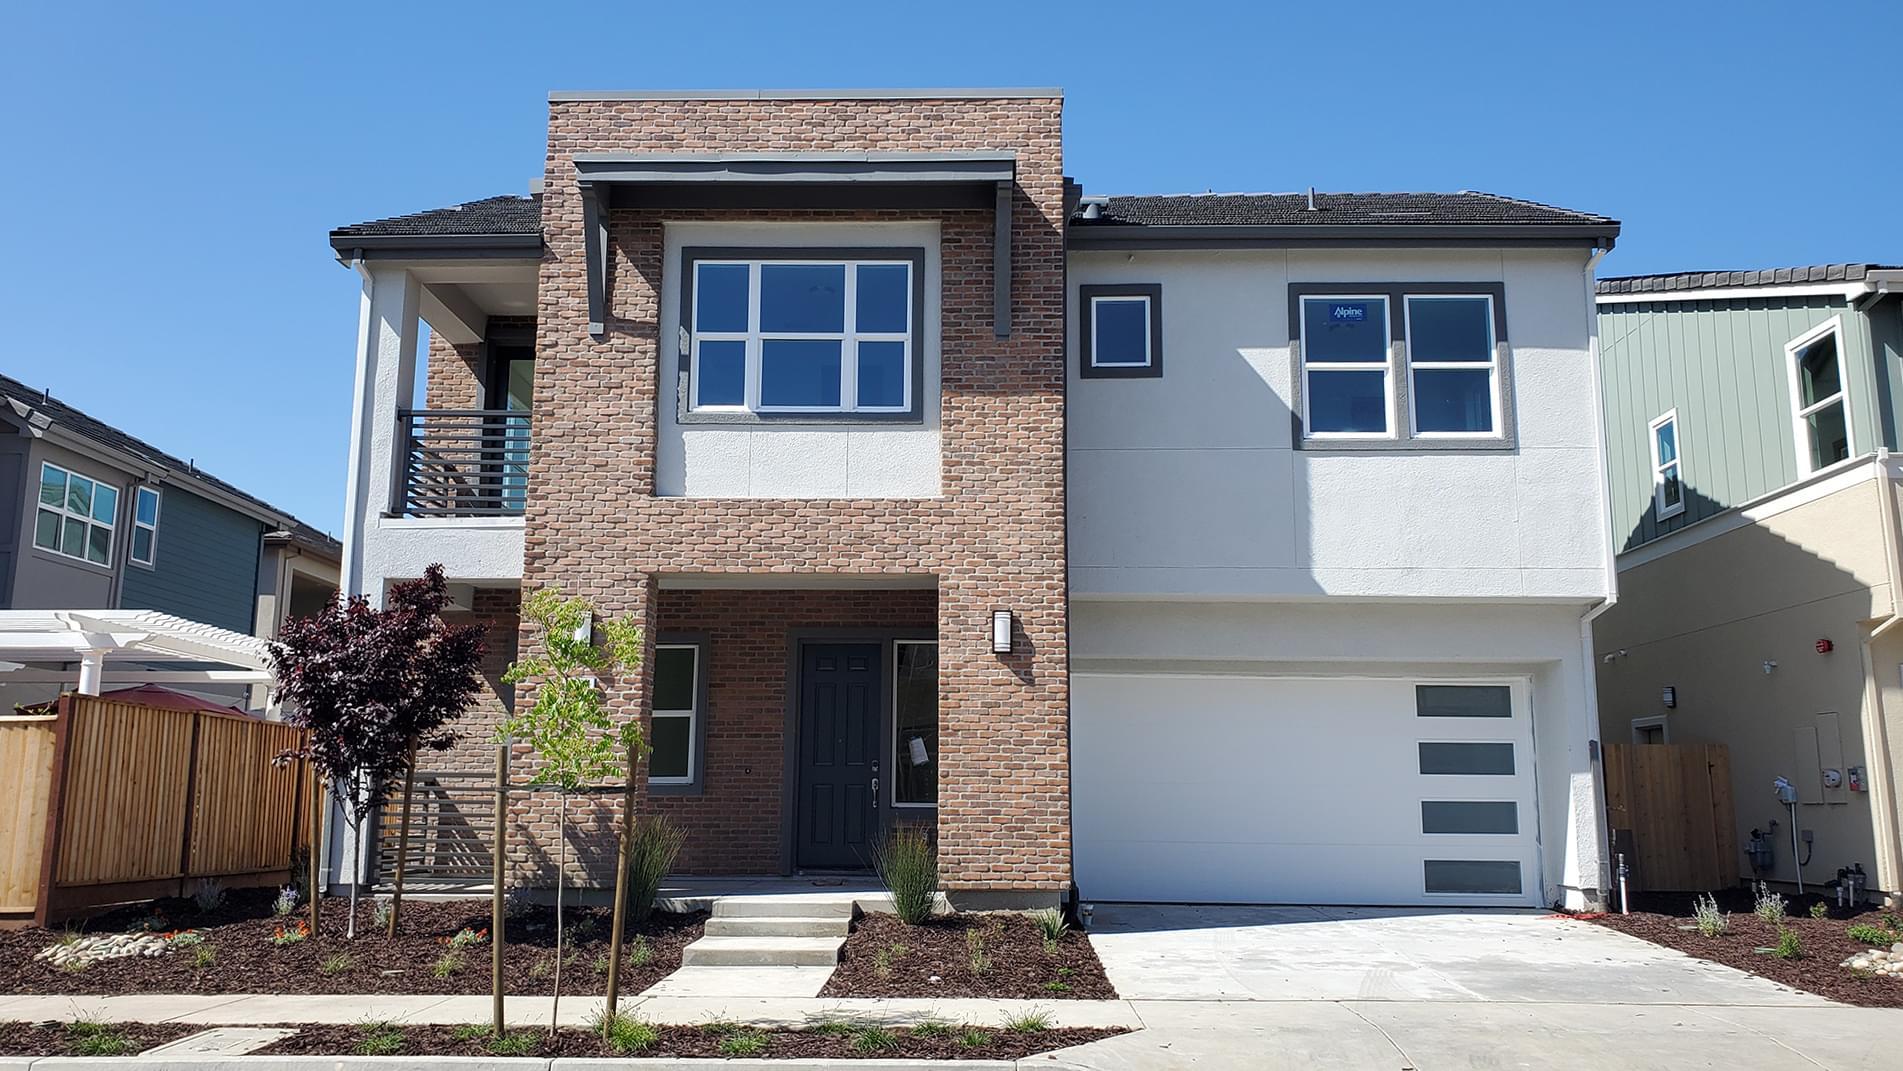 2301 Mirth Street in San Jose, CA by DeNova Homes